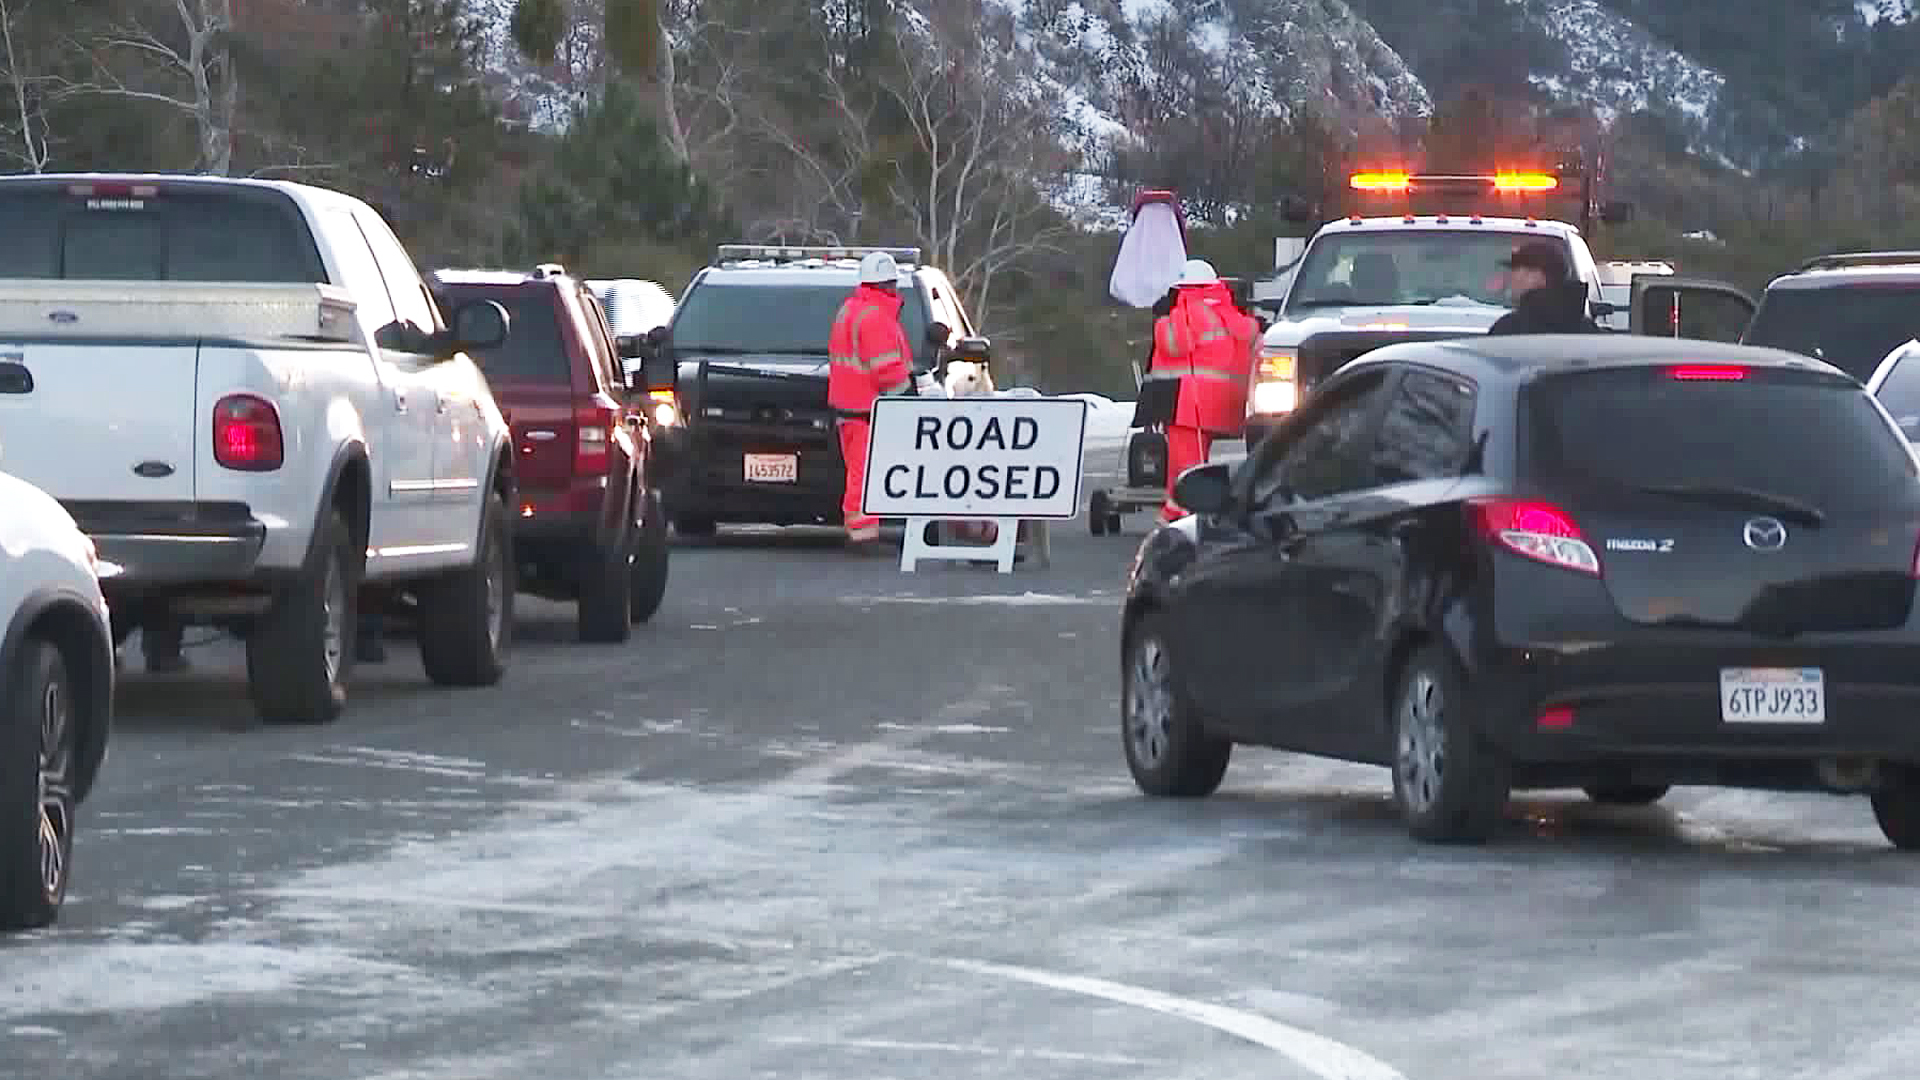 Drivers headed to big bear are stopped at a road closure. (Credit: KTLA)